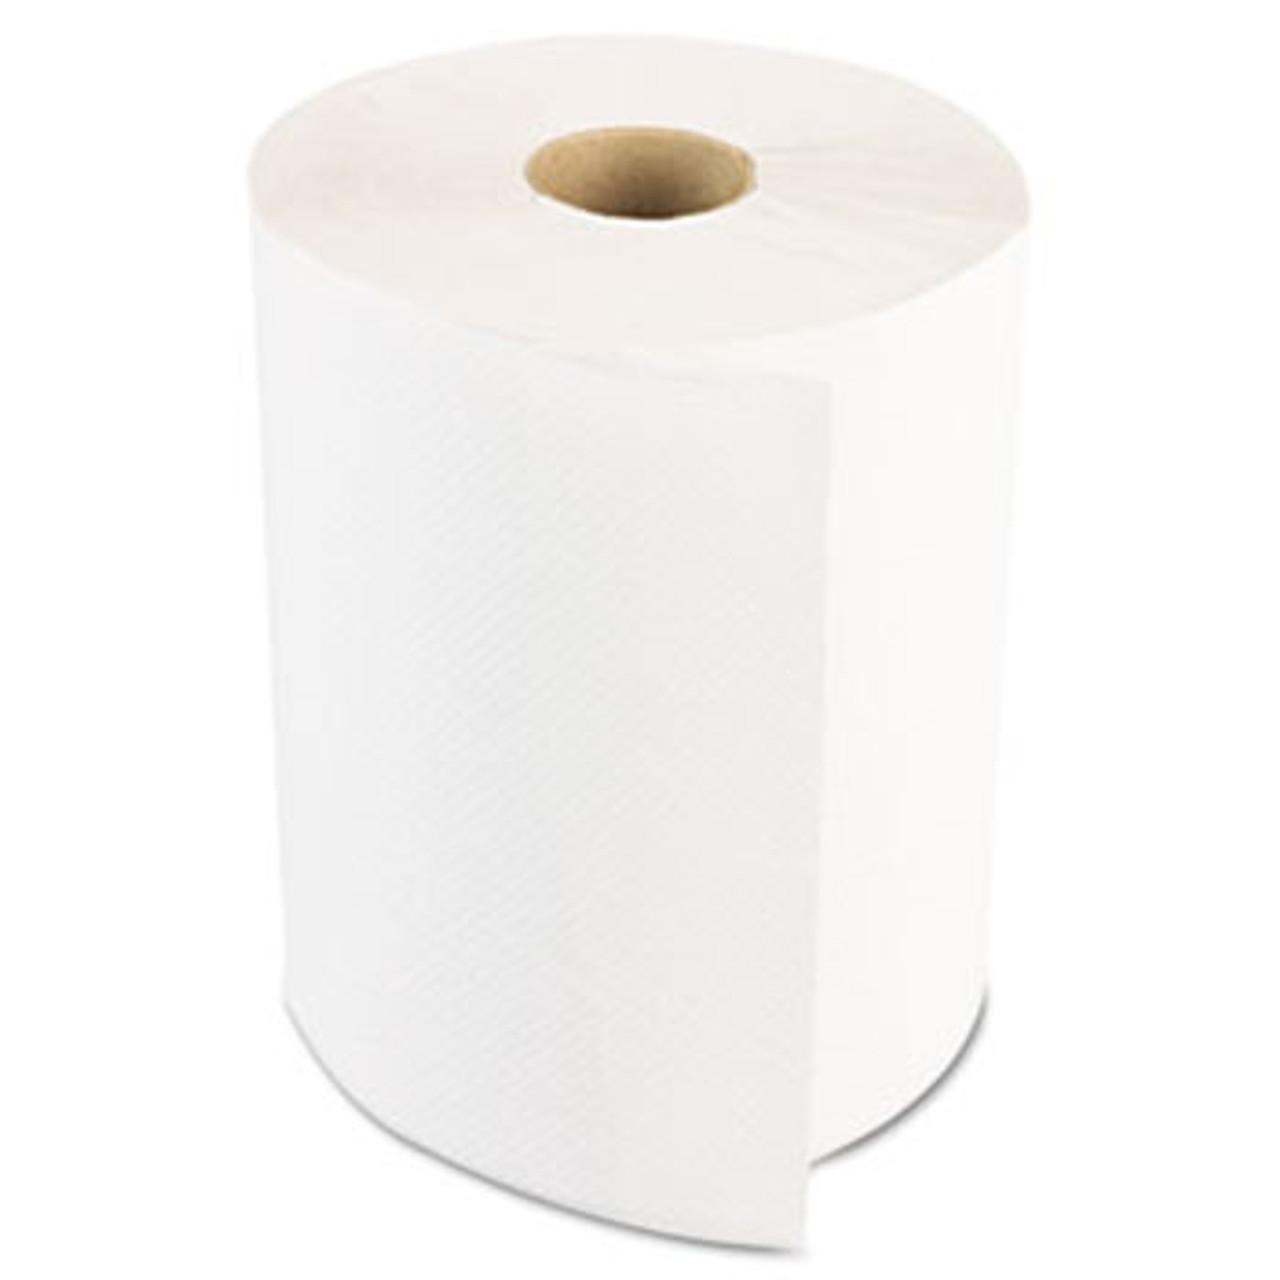 "Hardwound Paper Towel Roll: 8"" x 800'"